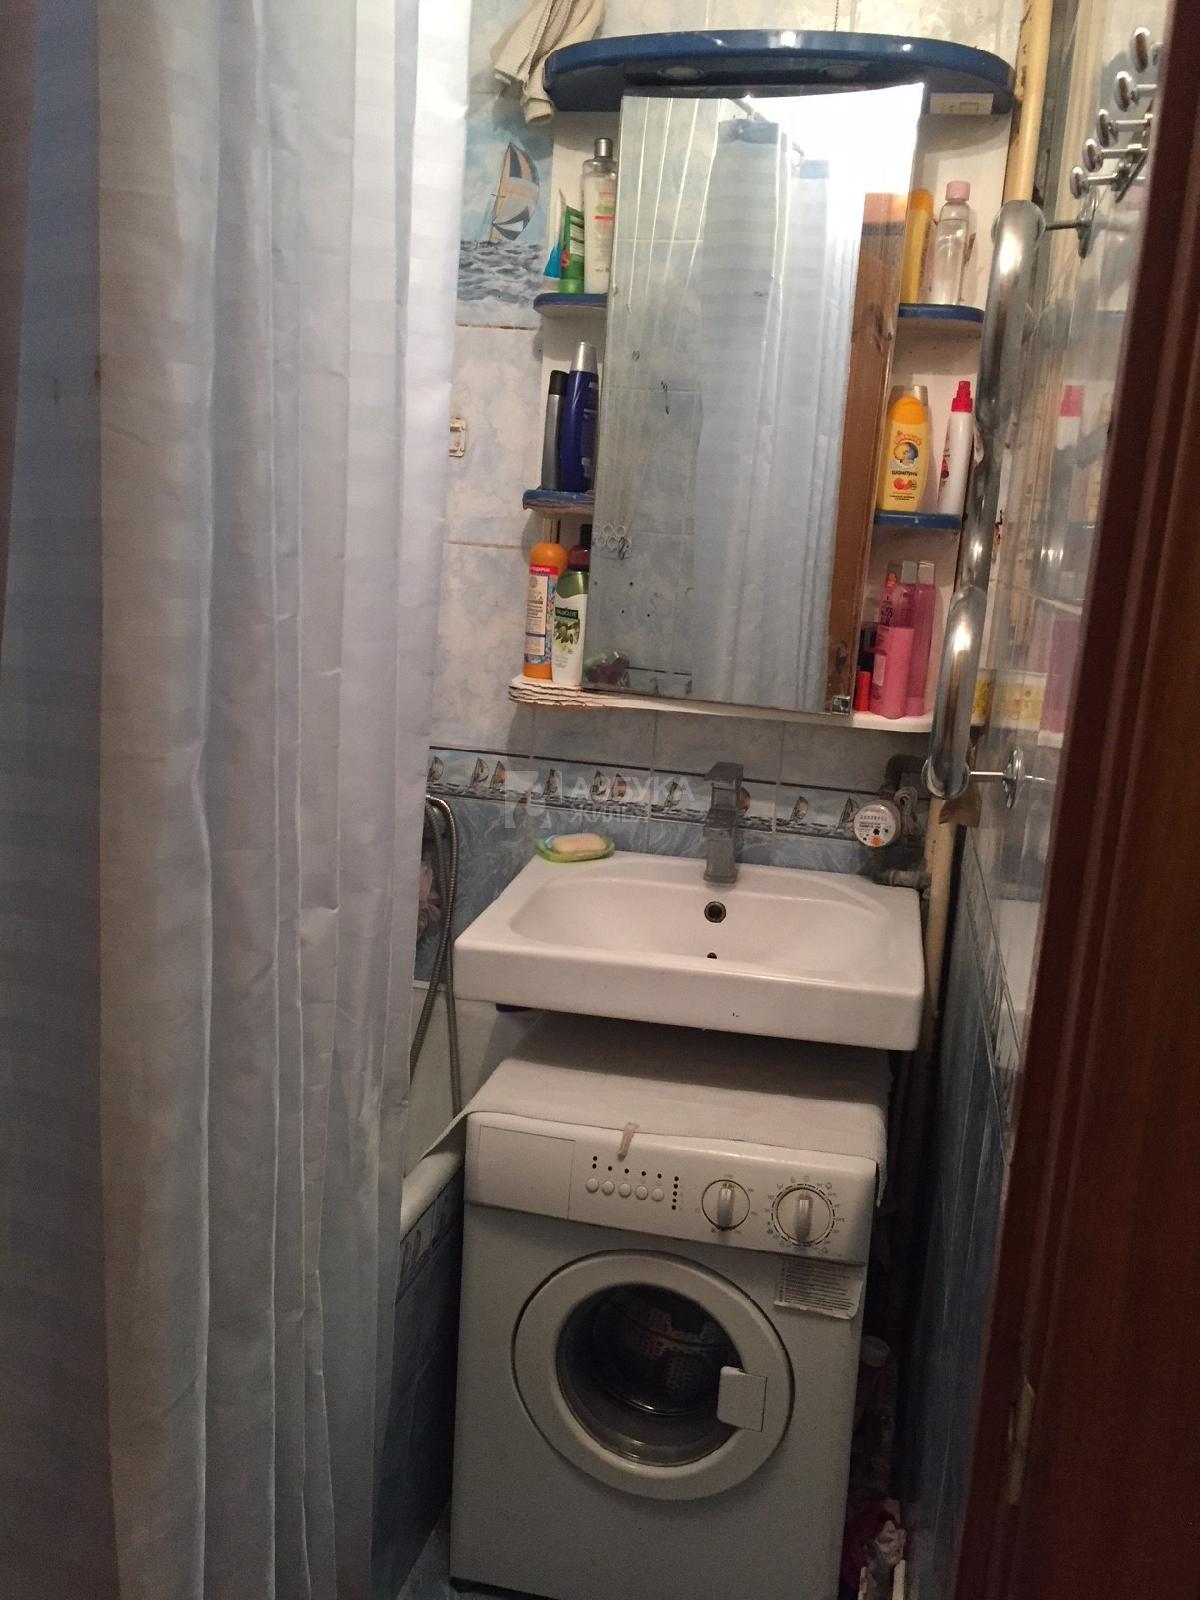 Фото №13 - 3-комнатная квартира, Москва, Криворожская улица 15, метро Нагорная